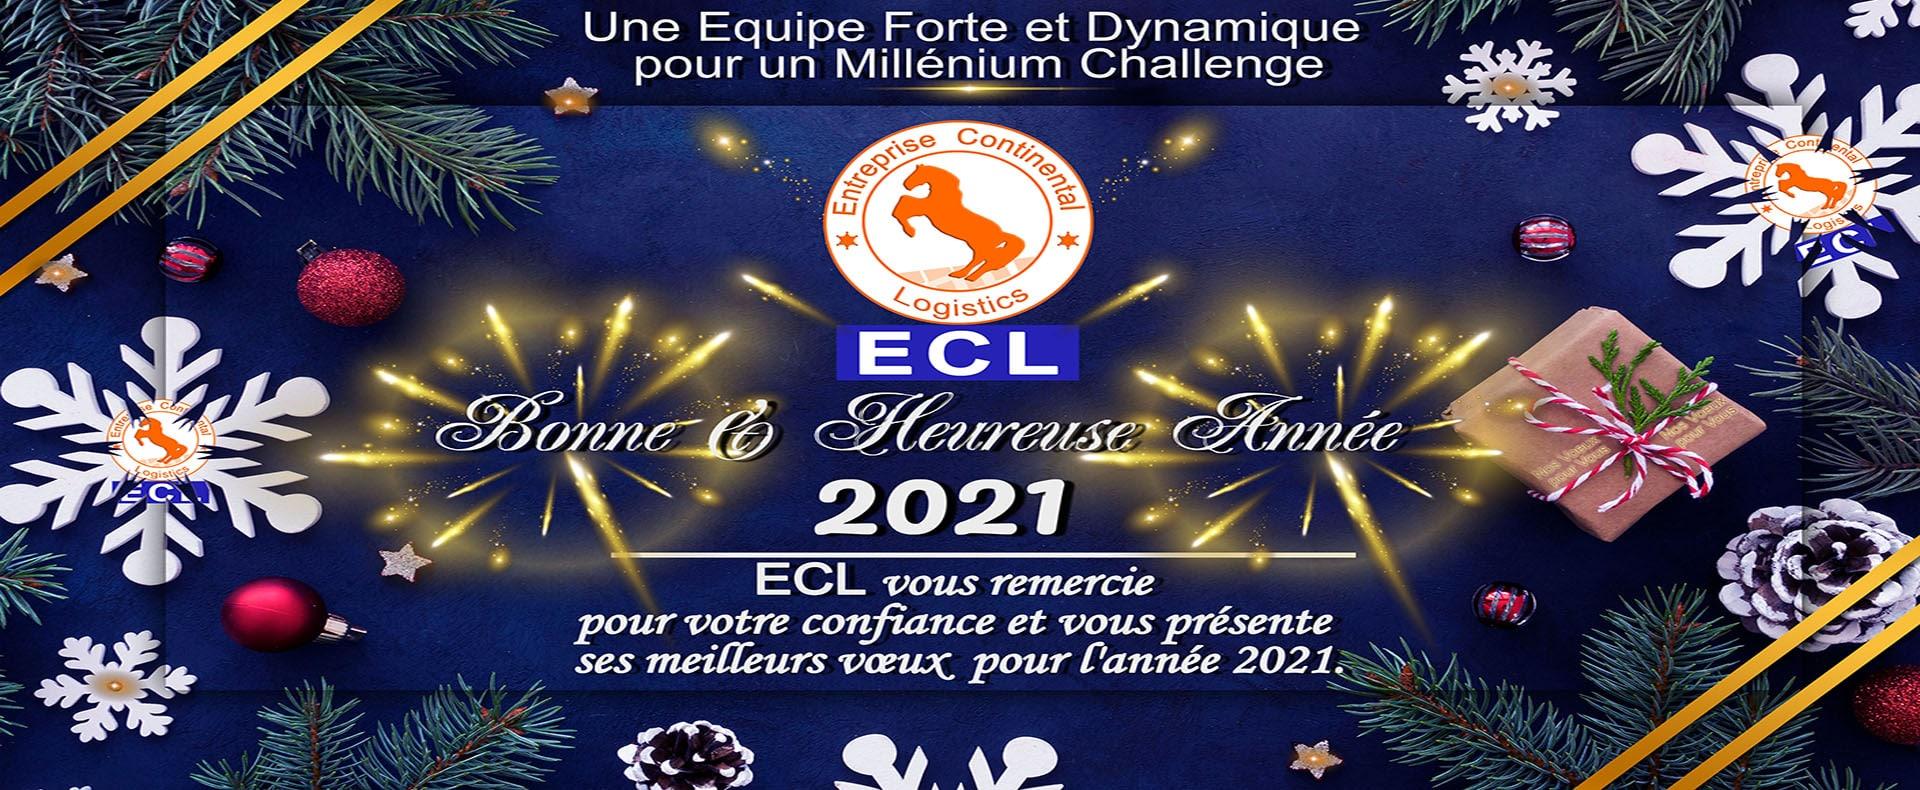 BONNE & HEUREUSE ANNEE 2021